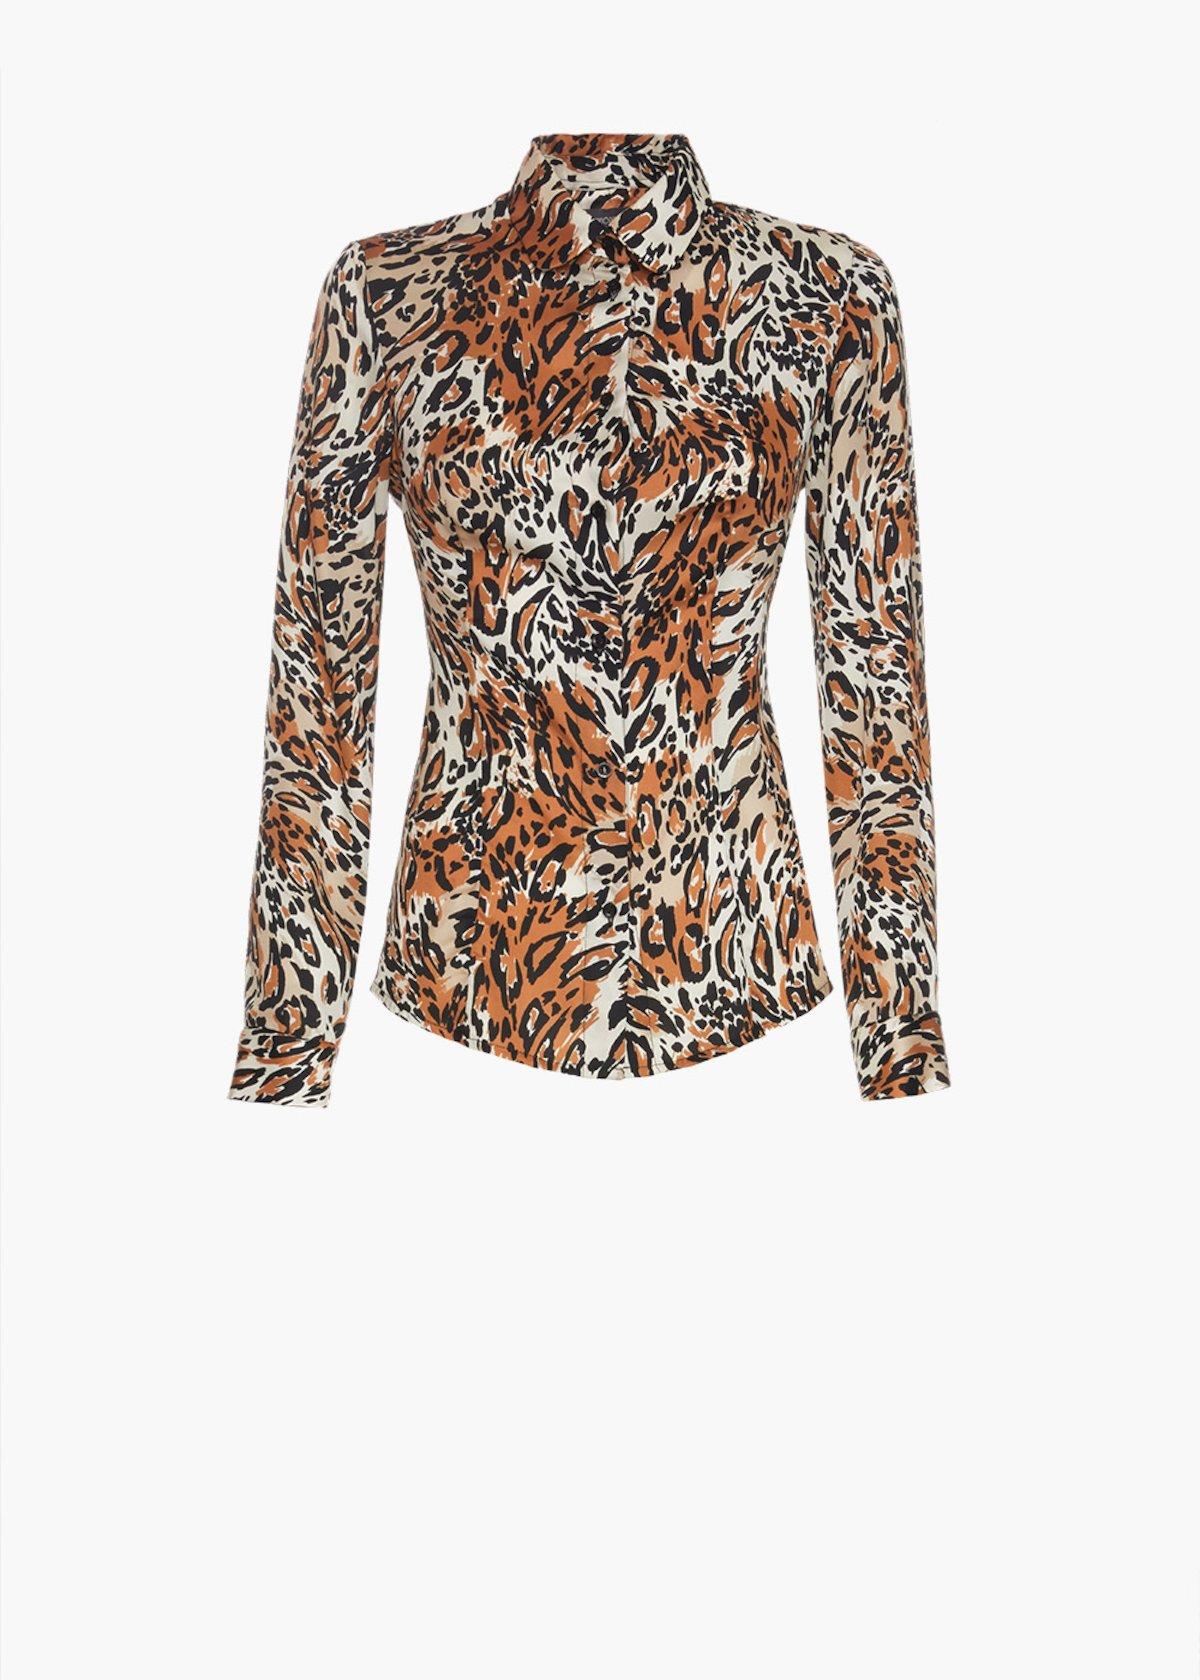 Camicia Cindy con stampa animalier - Beige Animalier - Donna